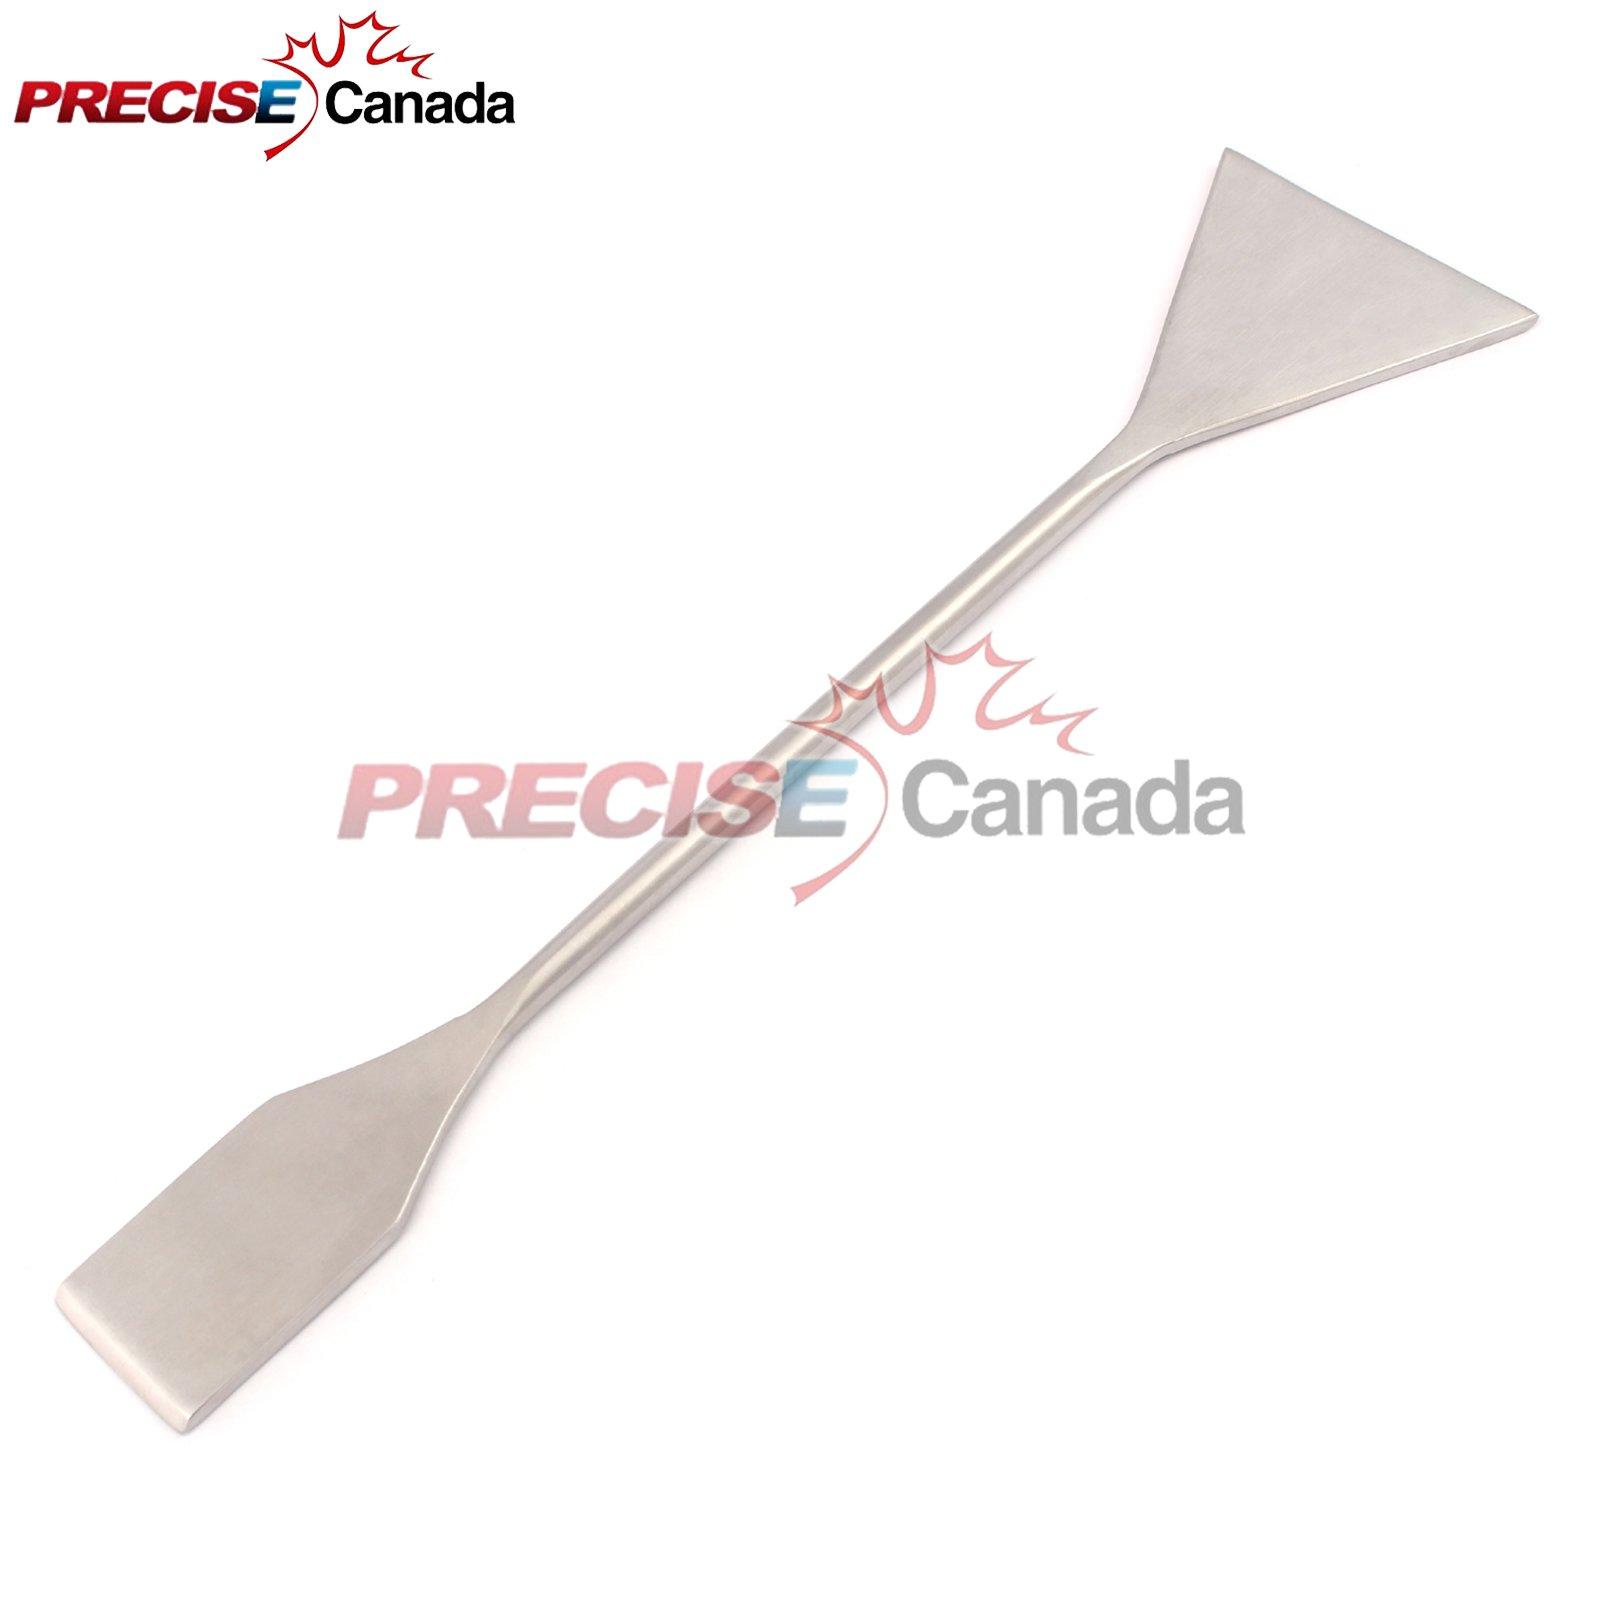 PRECISE CANADA Aquarium Tools, Stainless Steel Aquarium Curved Scissor Straight Tweezers Curved Tweezers Spatula Aquascaping Tools Kit For Fish Tank Plants by PRECISE CANADA (Image #3)